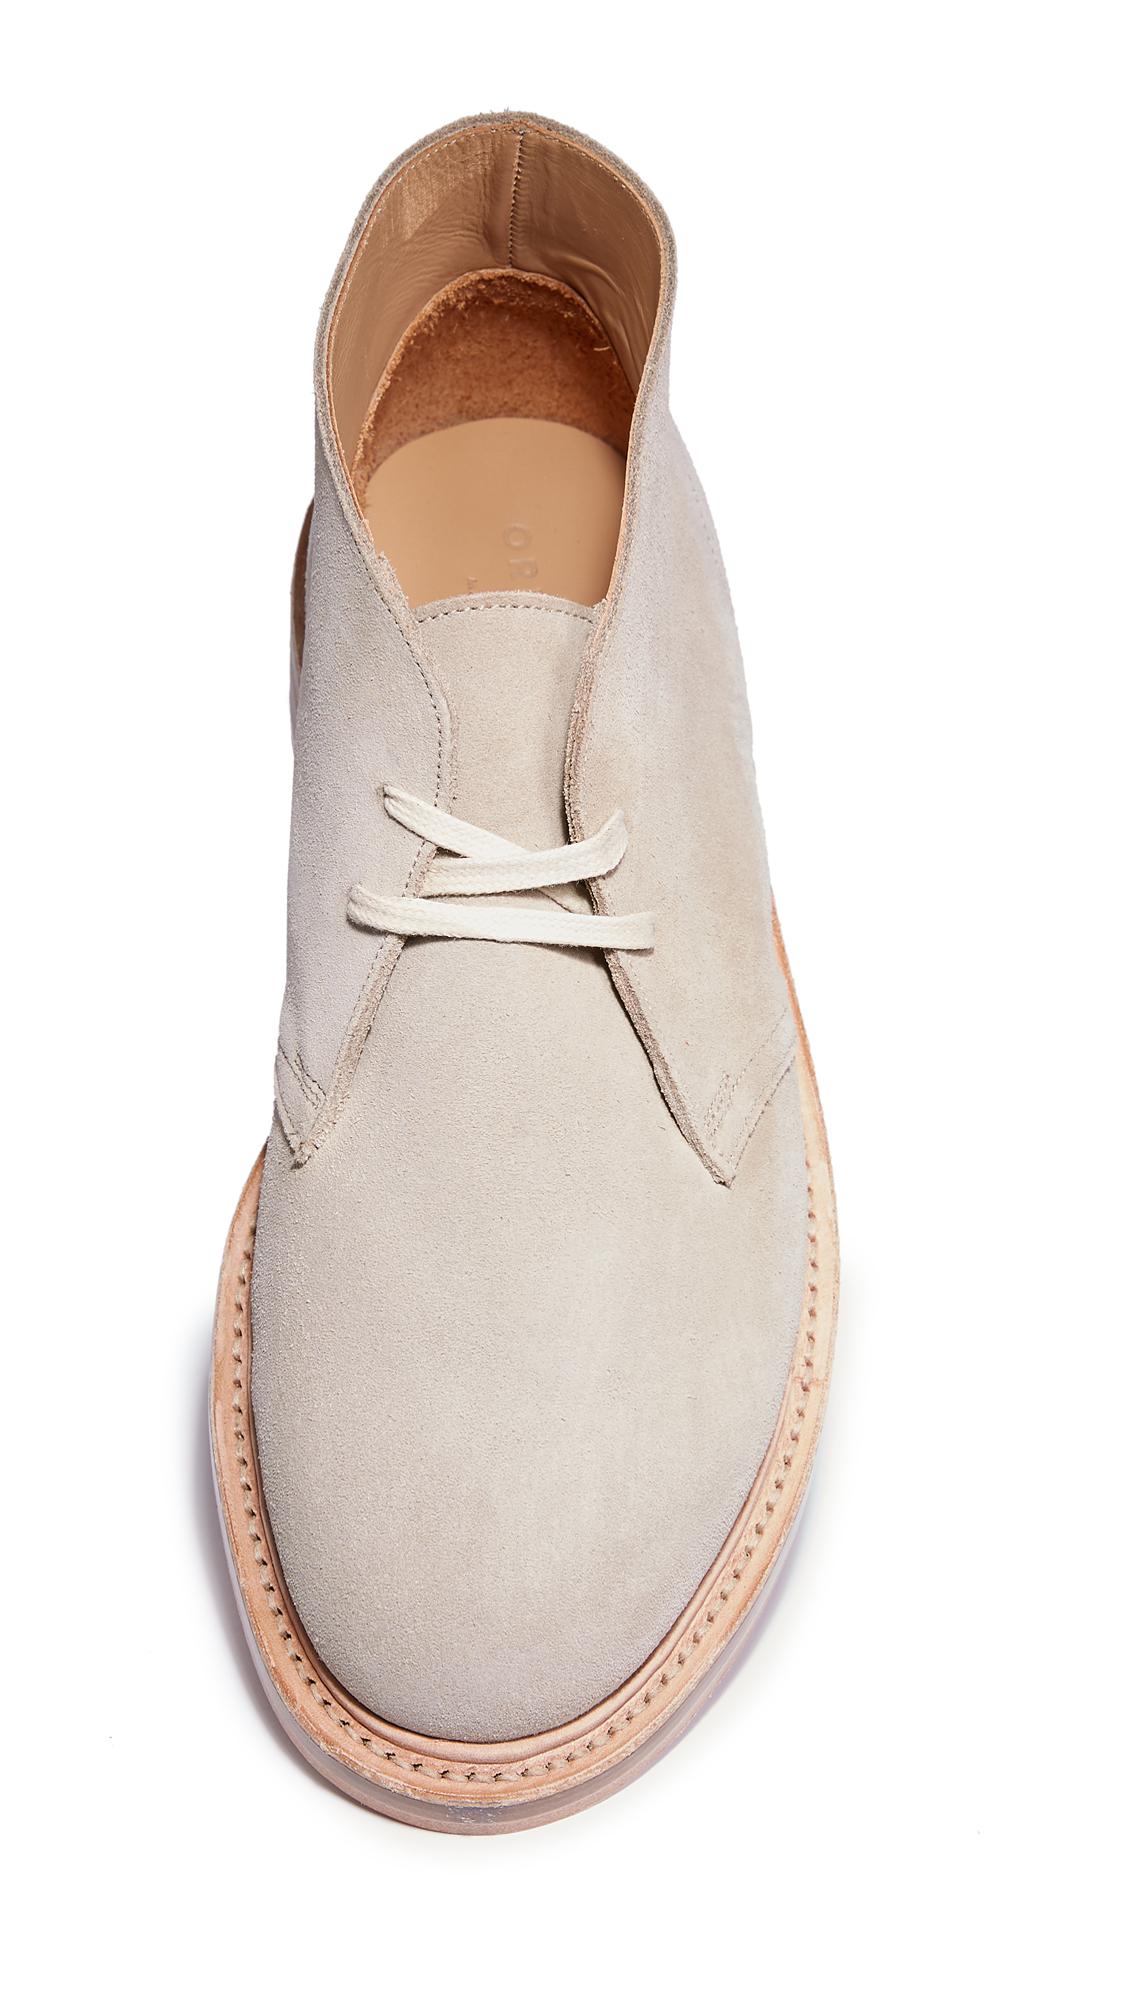 6ff03875164 Clarks Desert Welt Suede Boots